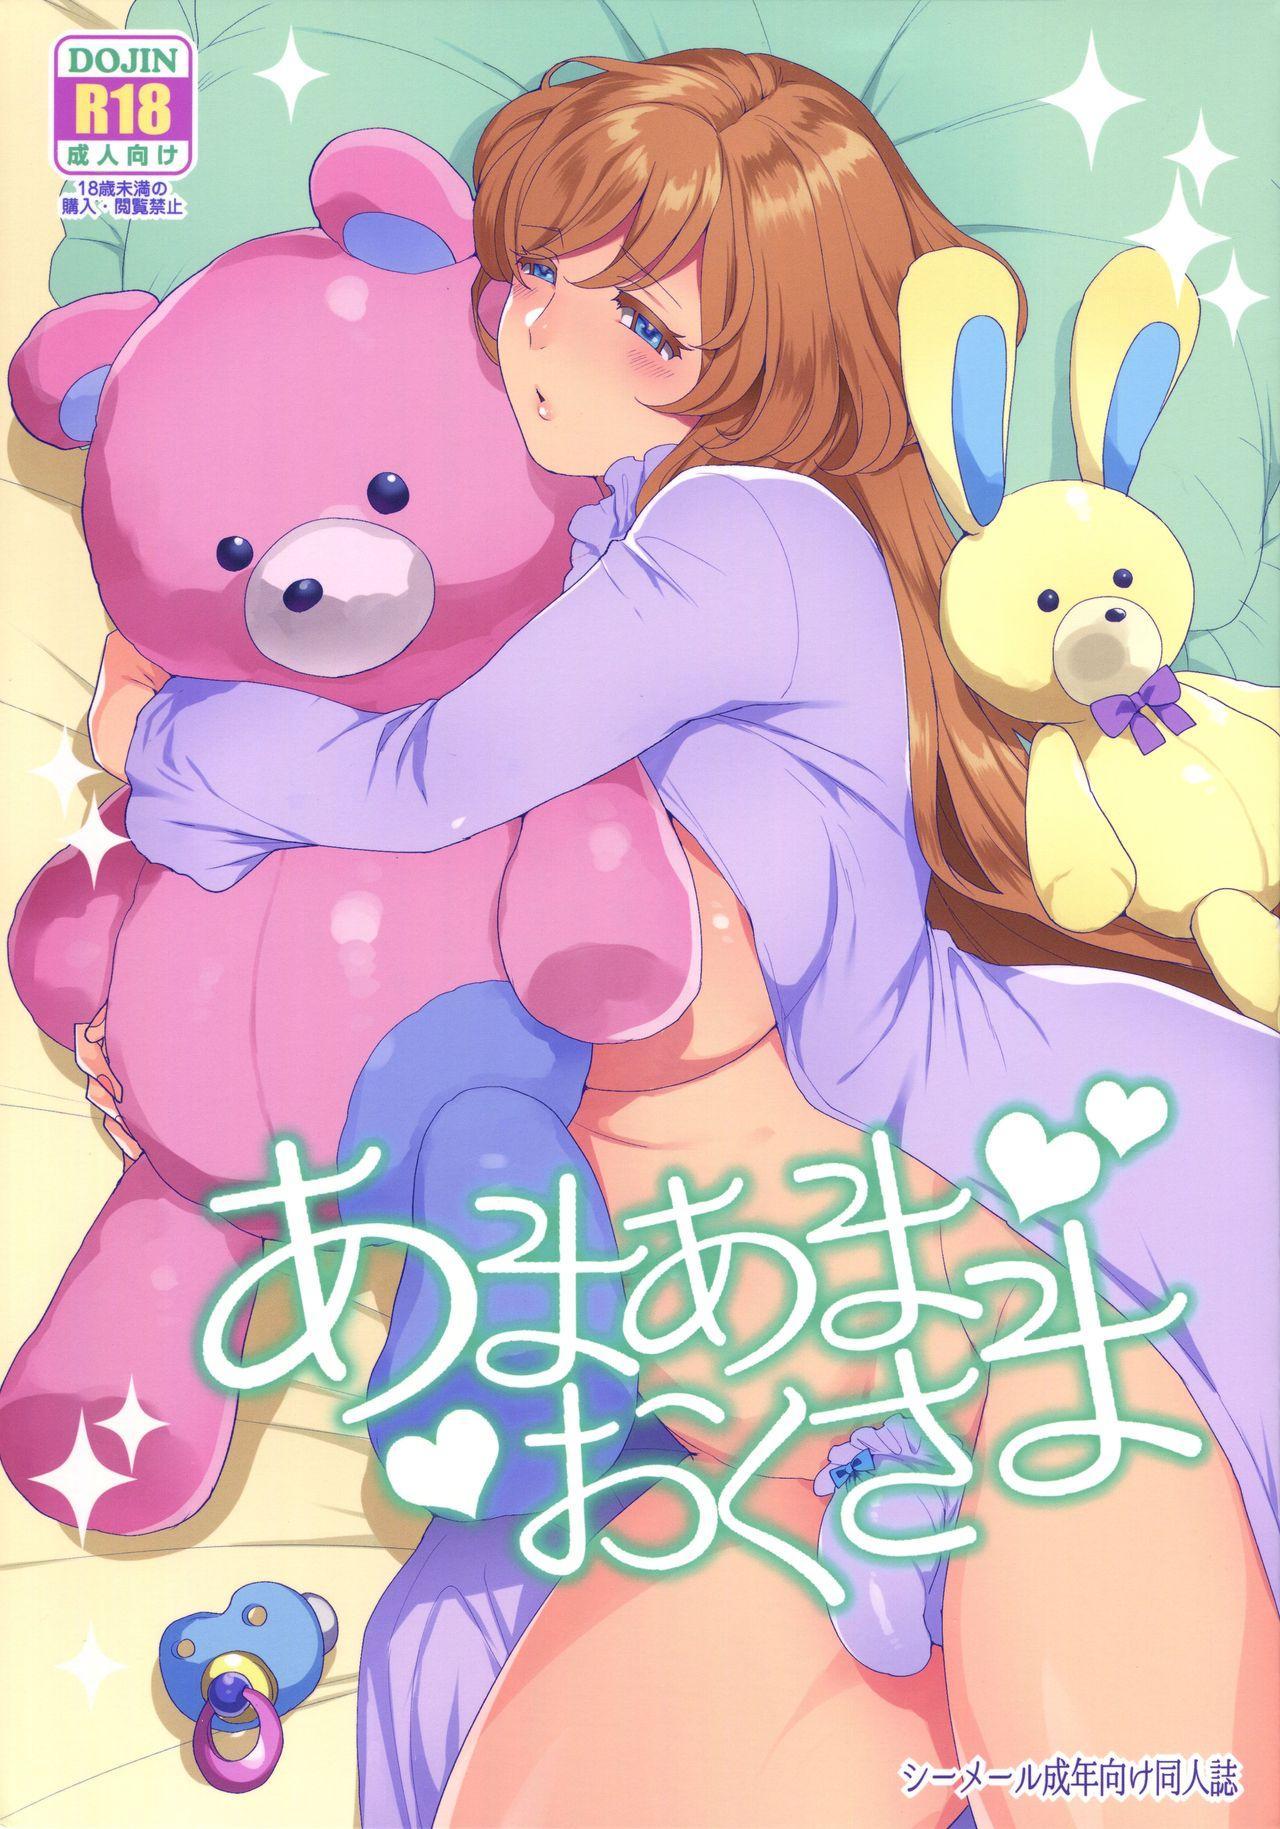 Amaama Oku-sama | Sweet Mistress 0